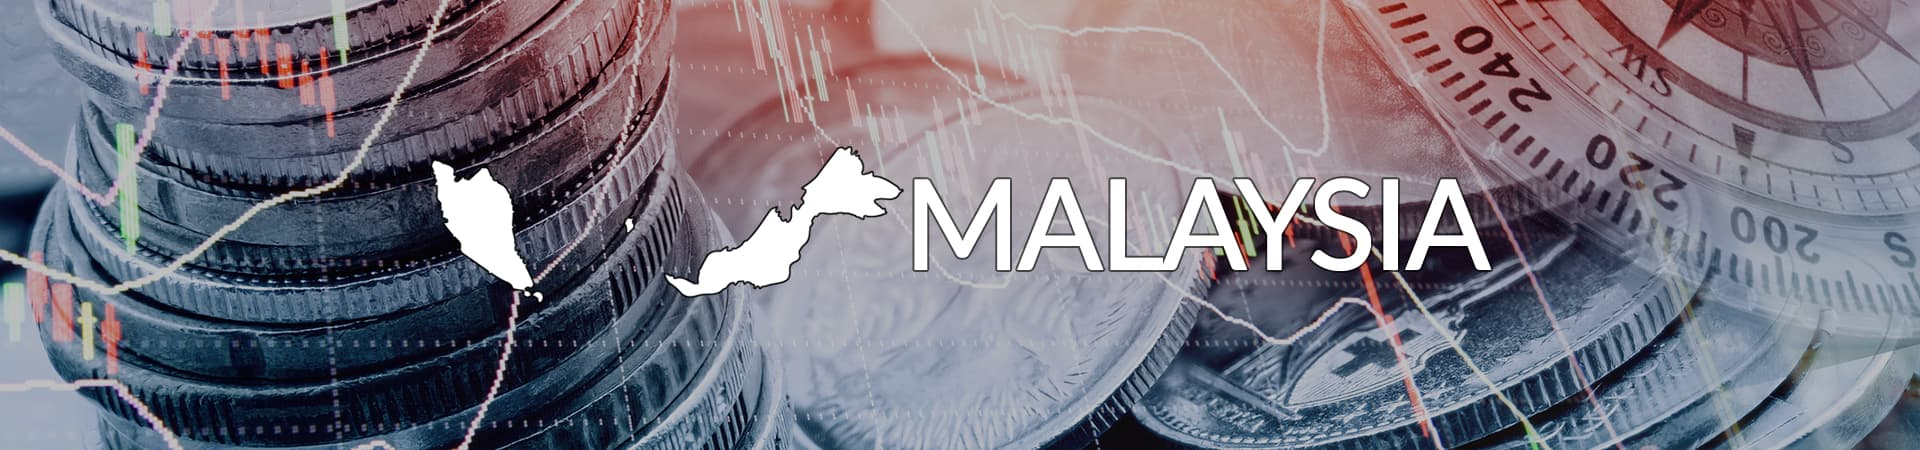 Malaysia banking banner